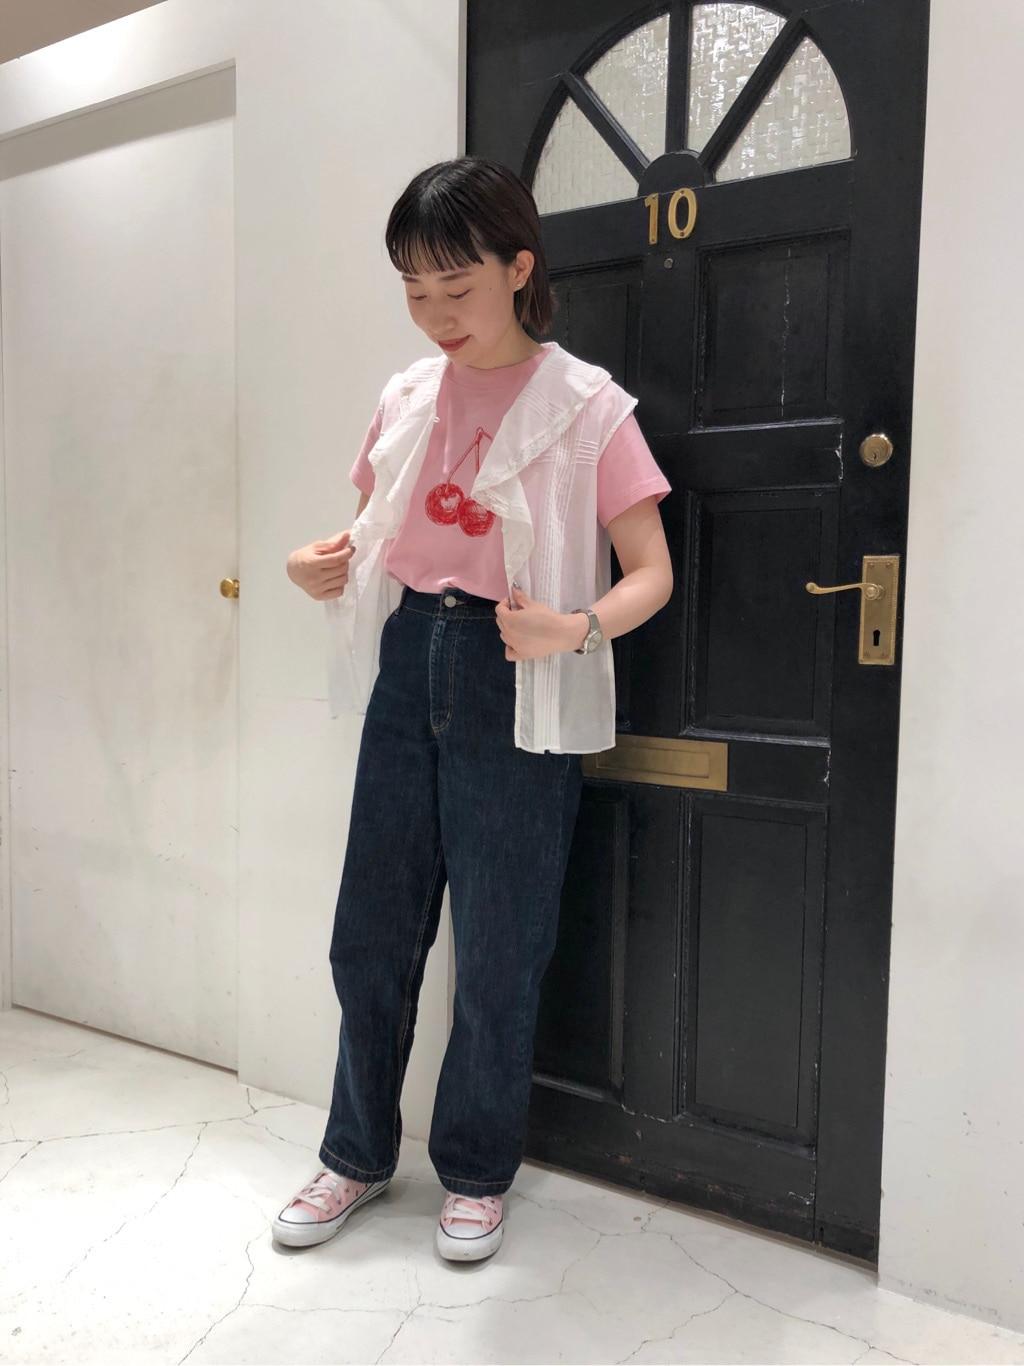 Dot and Stripes CHILD WOMAN ルクアイーレ 身長:157cm 2021.06.06